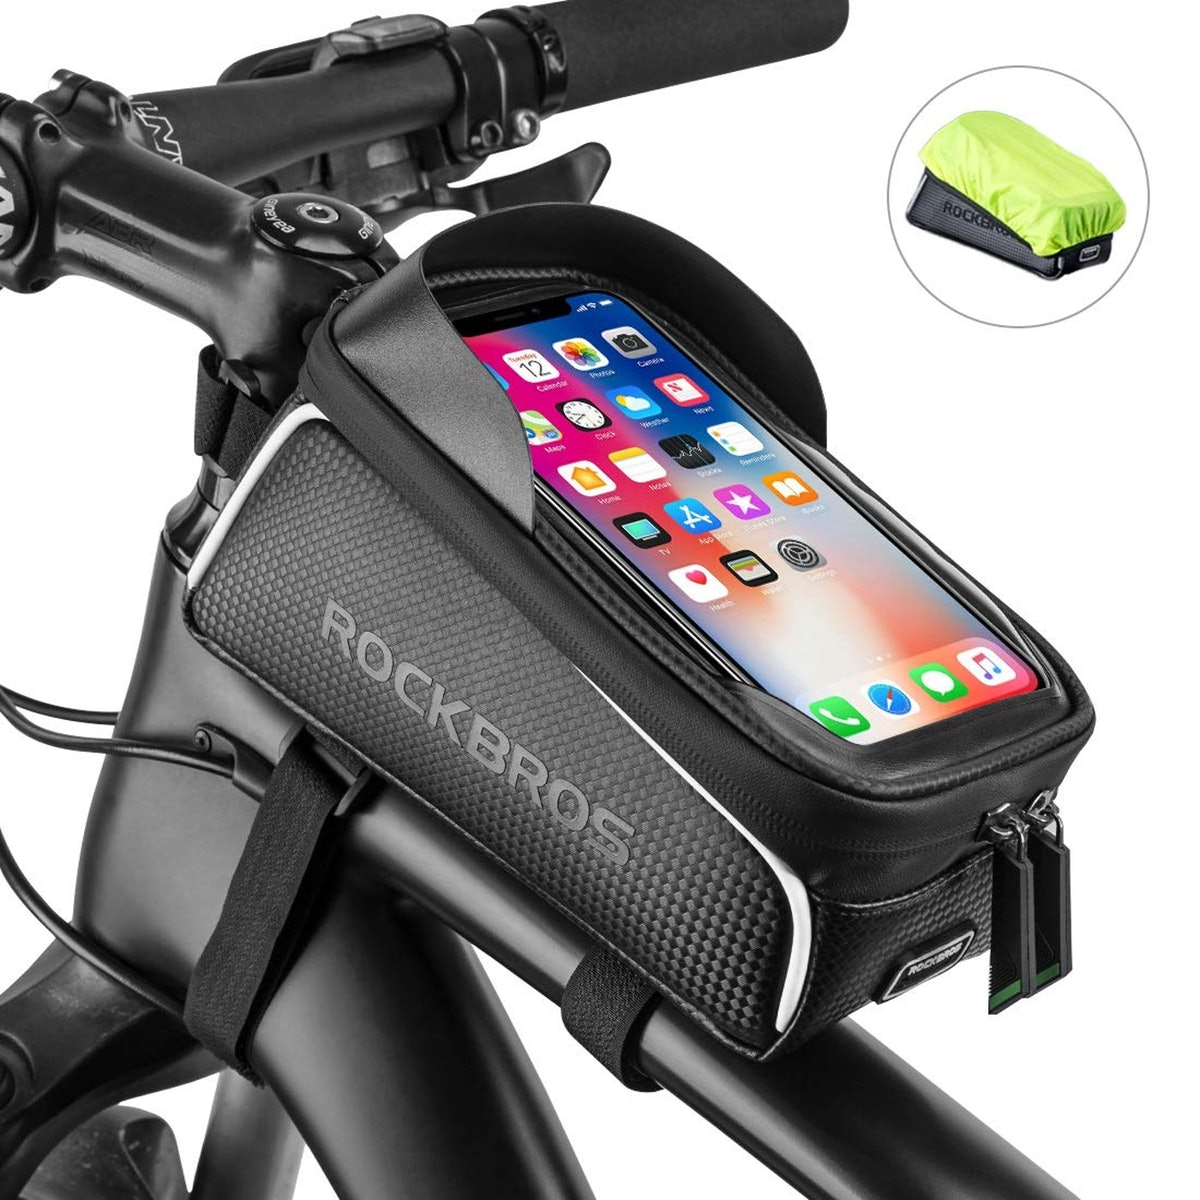 ROCK BROS Bike Phone Bag Mount